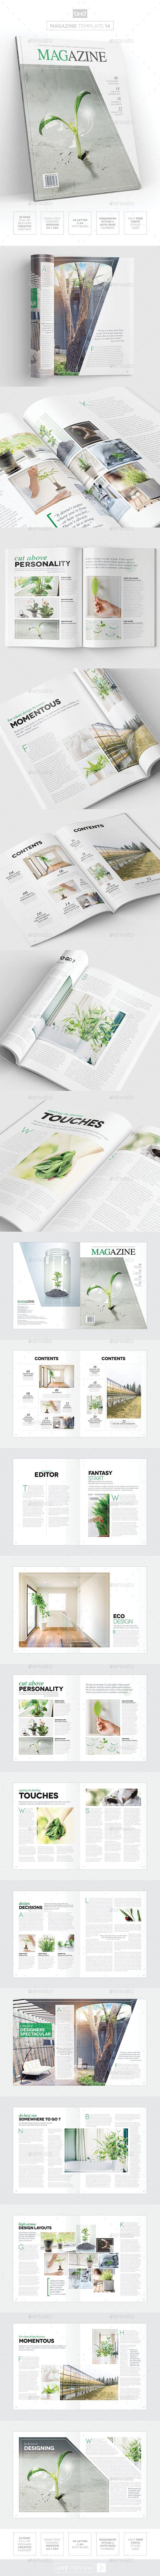 Magazine Template - InDesign 24 Page Layout V14 | Portadas de libros ...